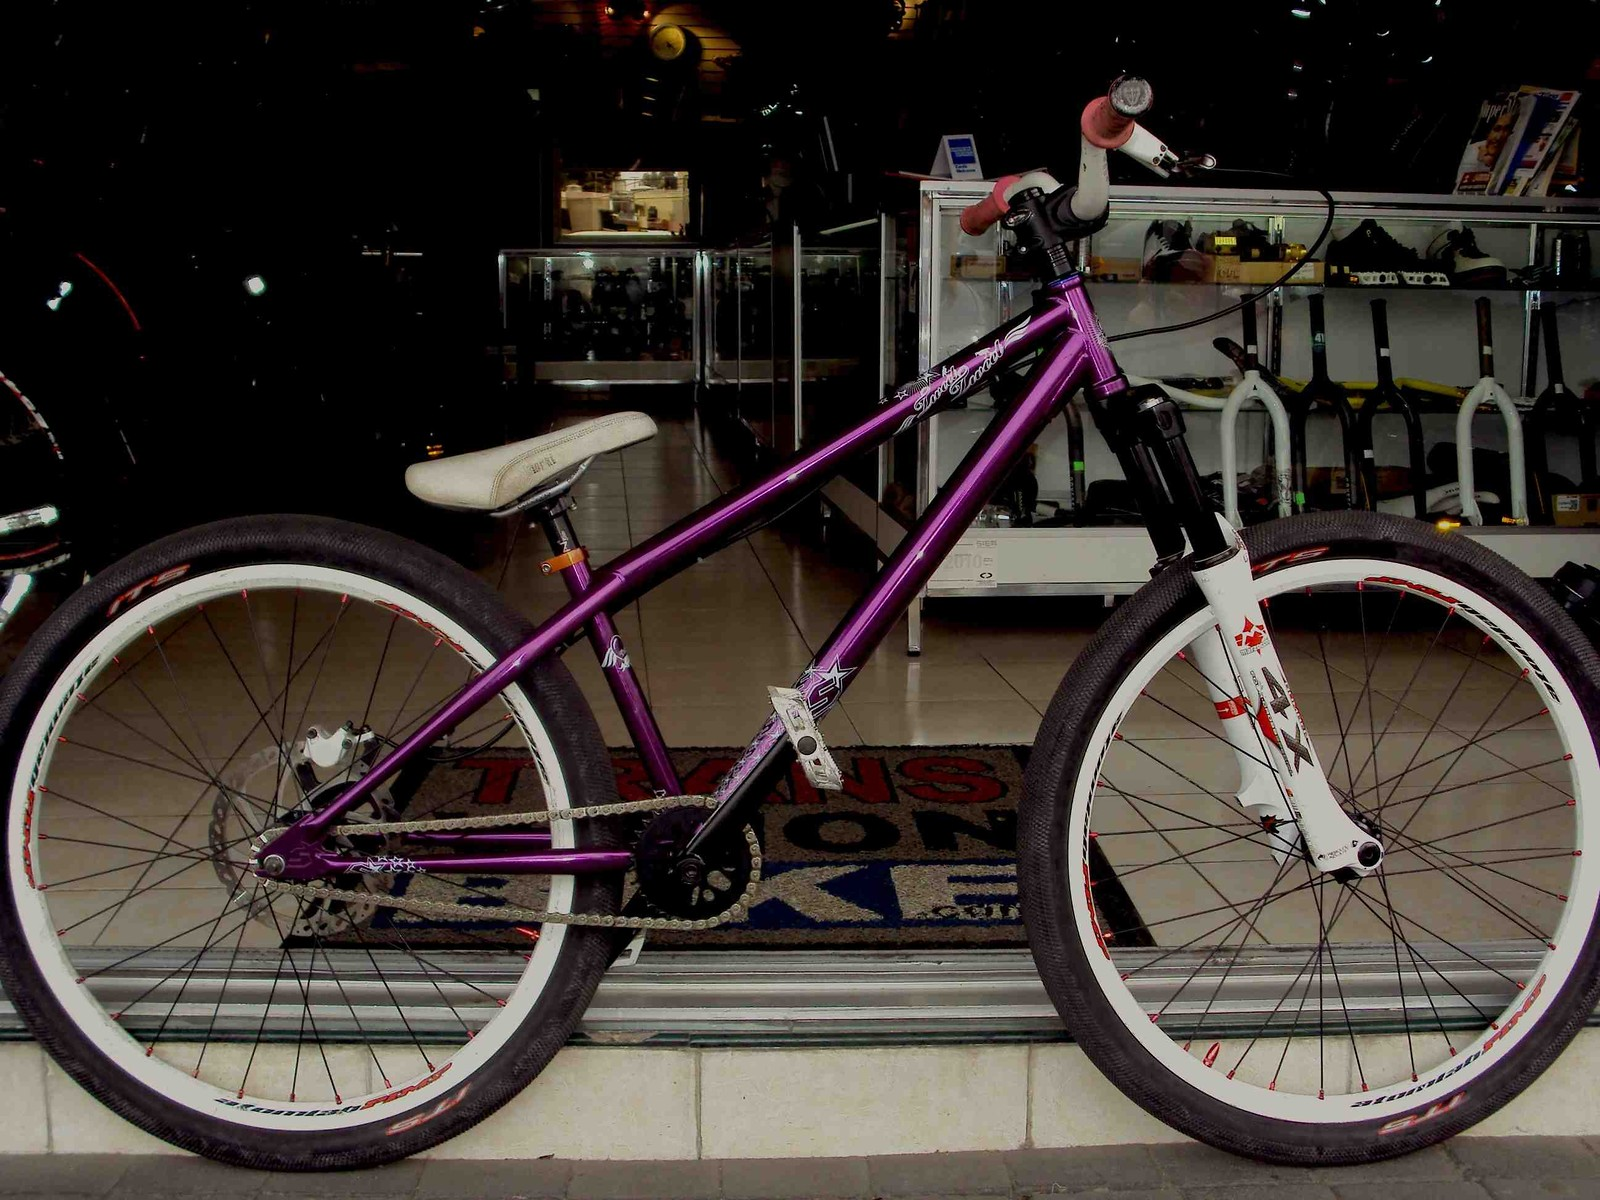 My Spank - EL PAVO - Mountain Biking Pictures - Vital MTB